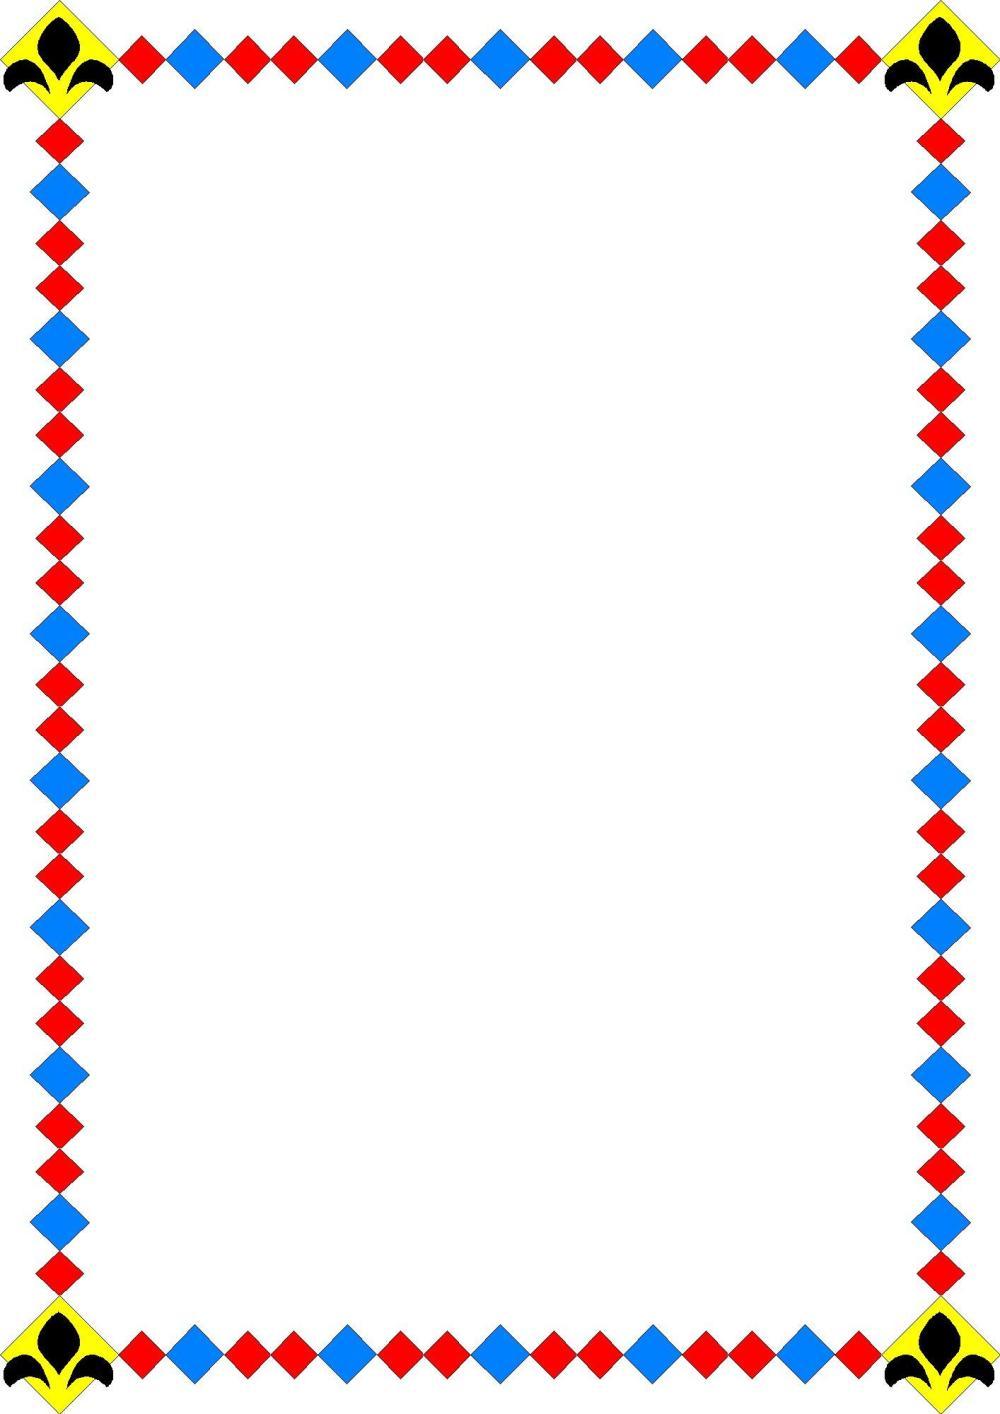 medium resolution of free clipart frame